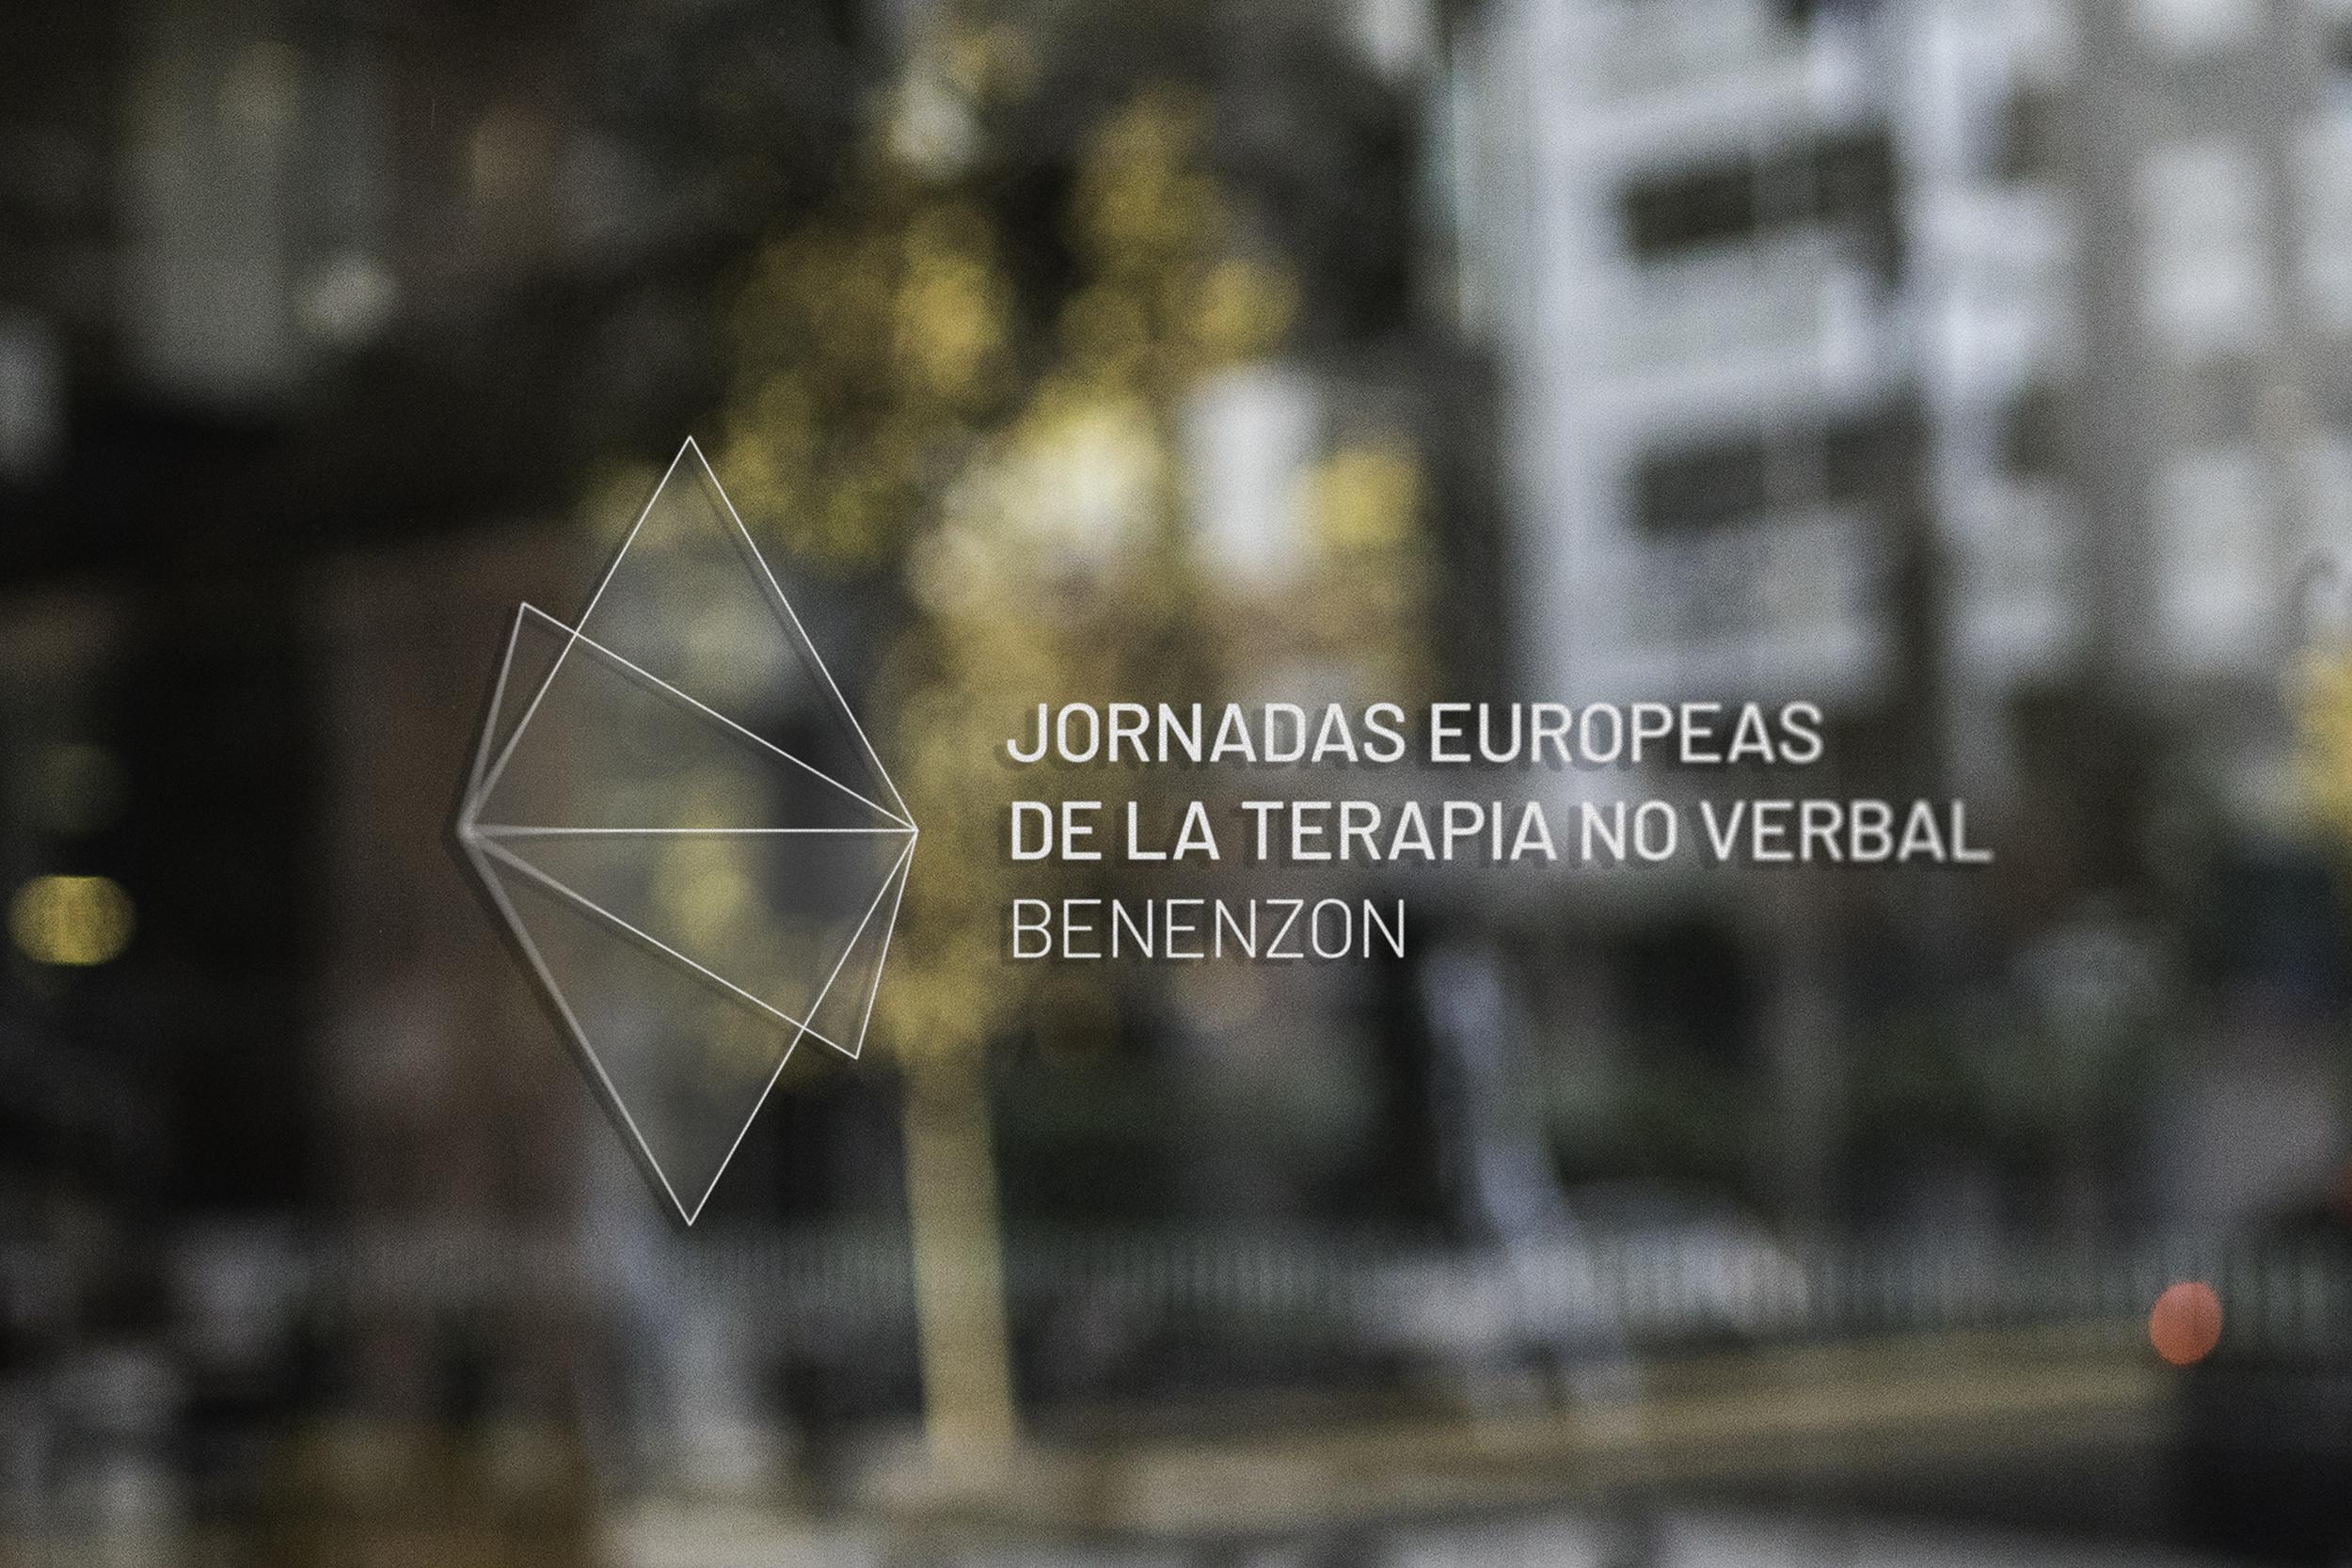 Jornadas Europeas Benenzon 01.jpg